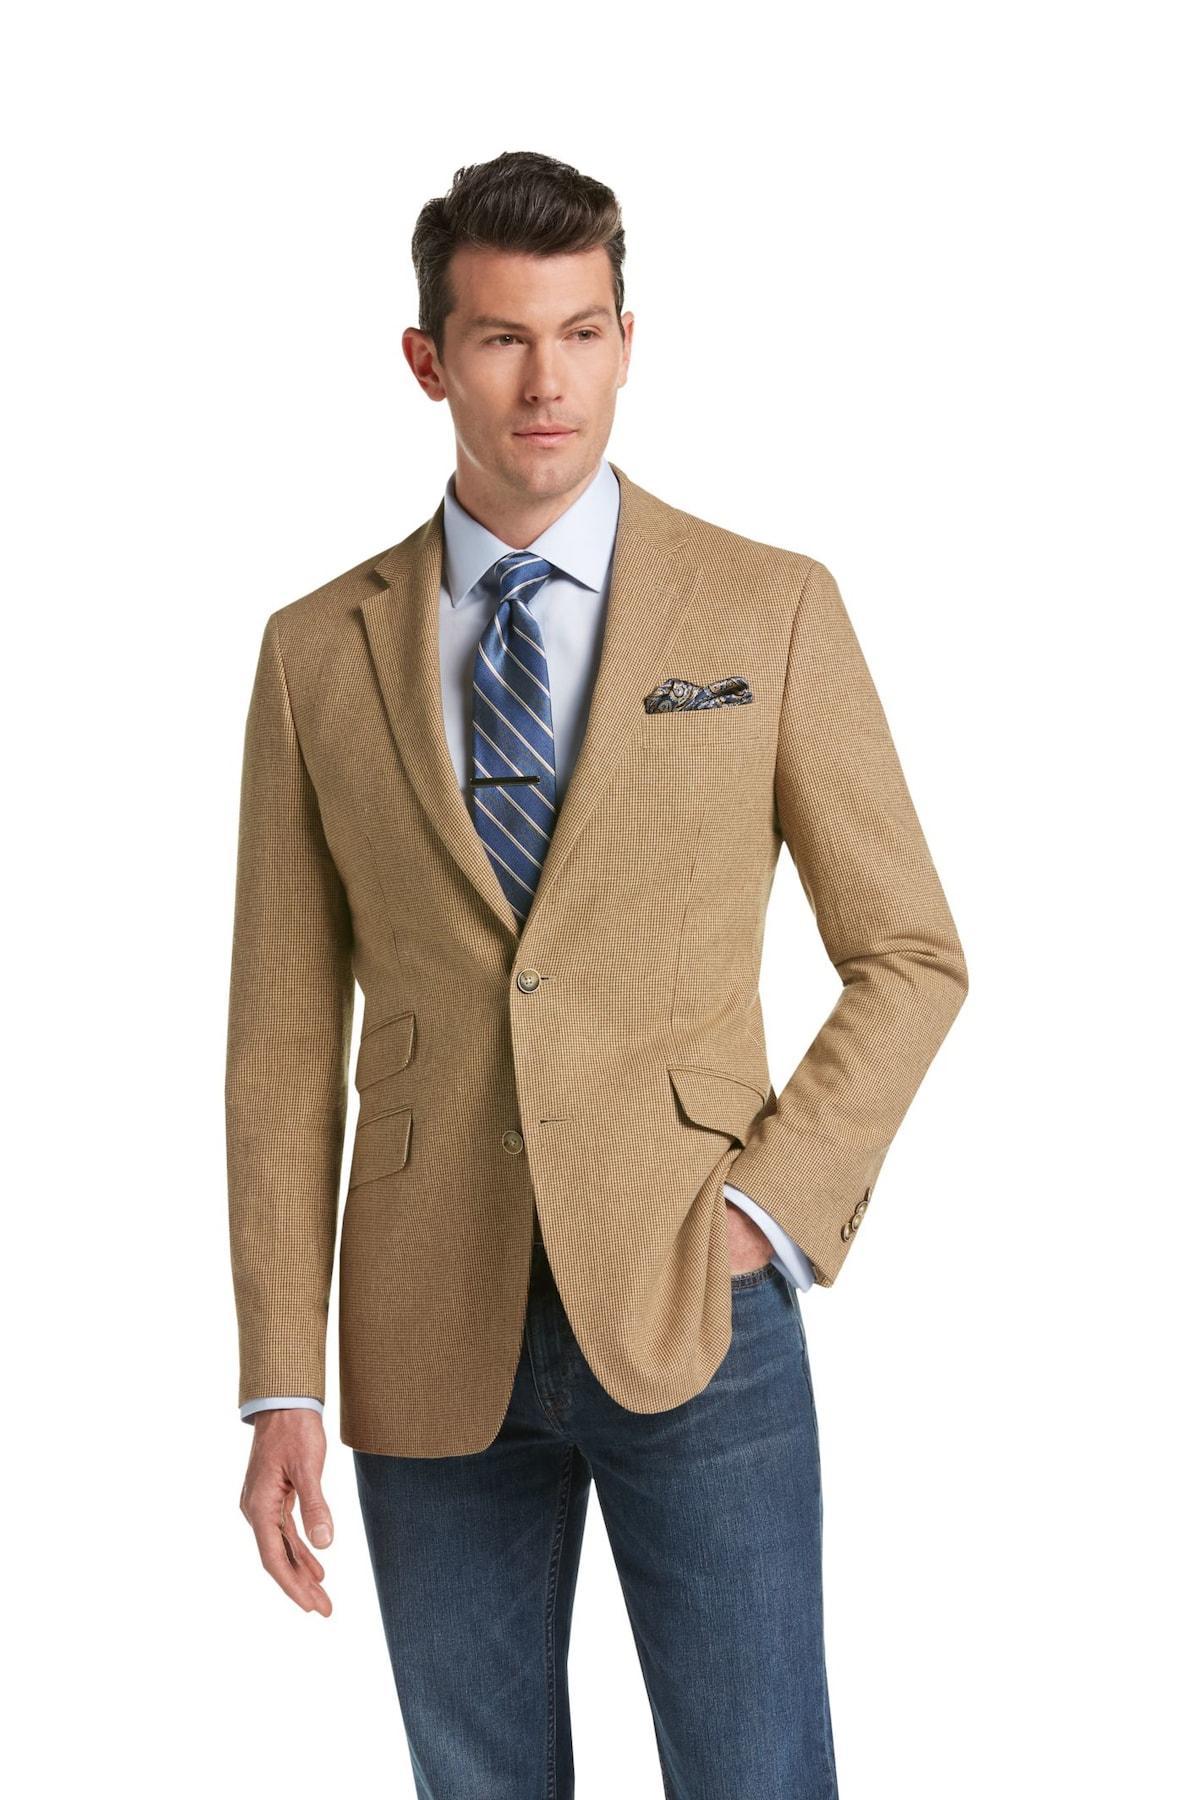 Lyst jos a bank joseph abboud linen tan tic tailored for Jos a bank slim fit vs tailored fit shirts